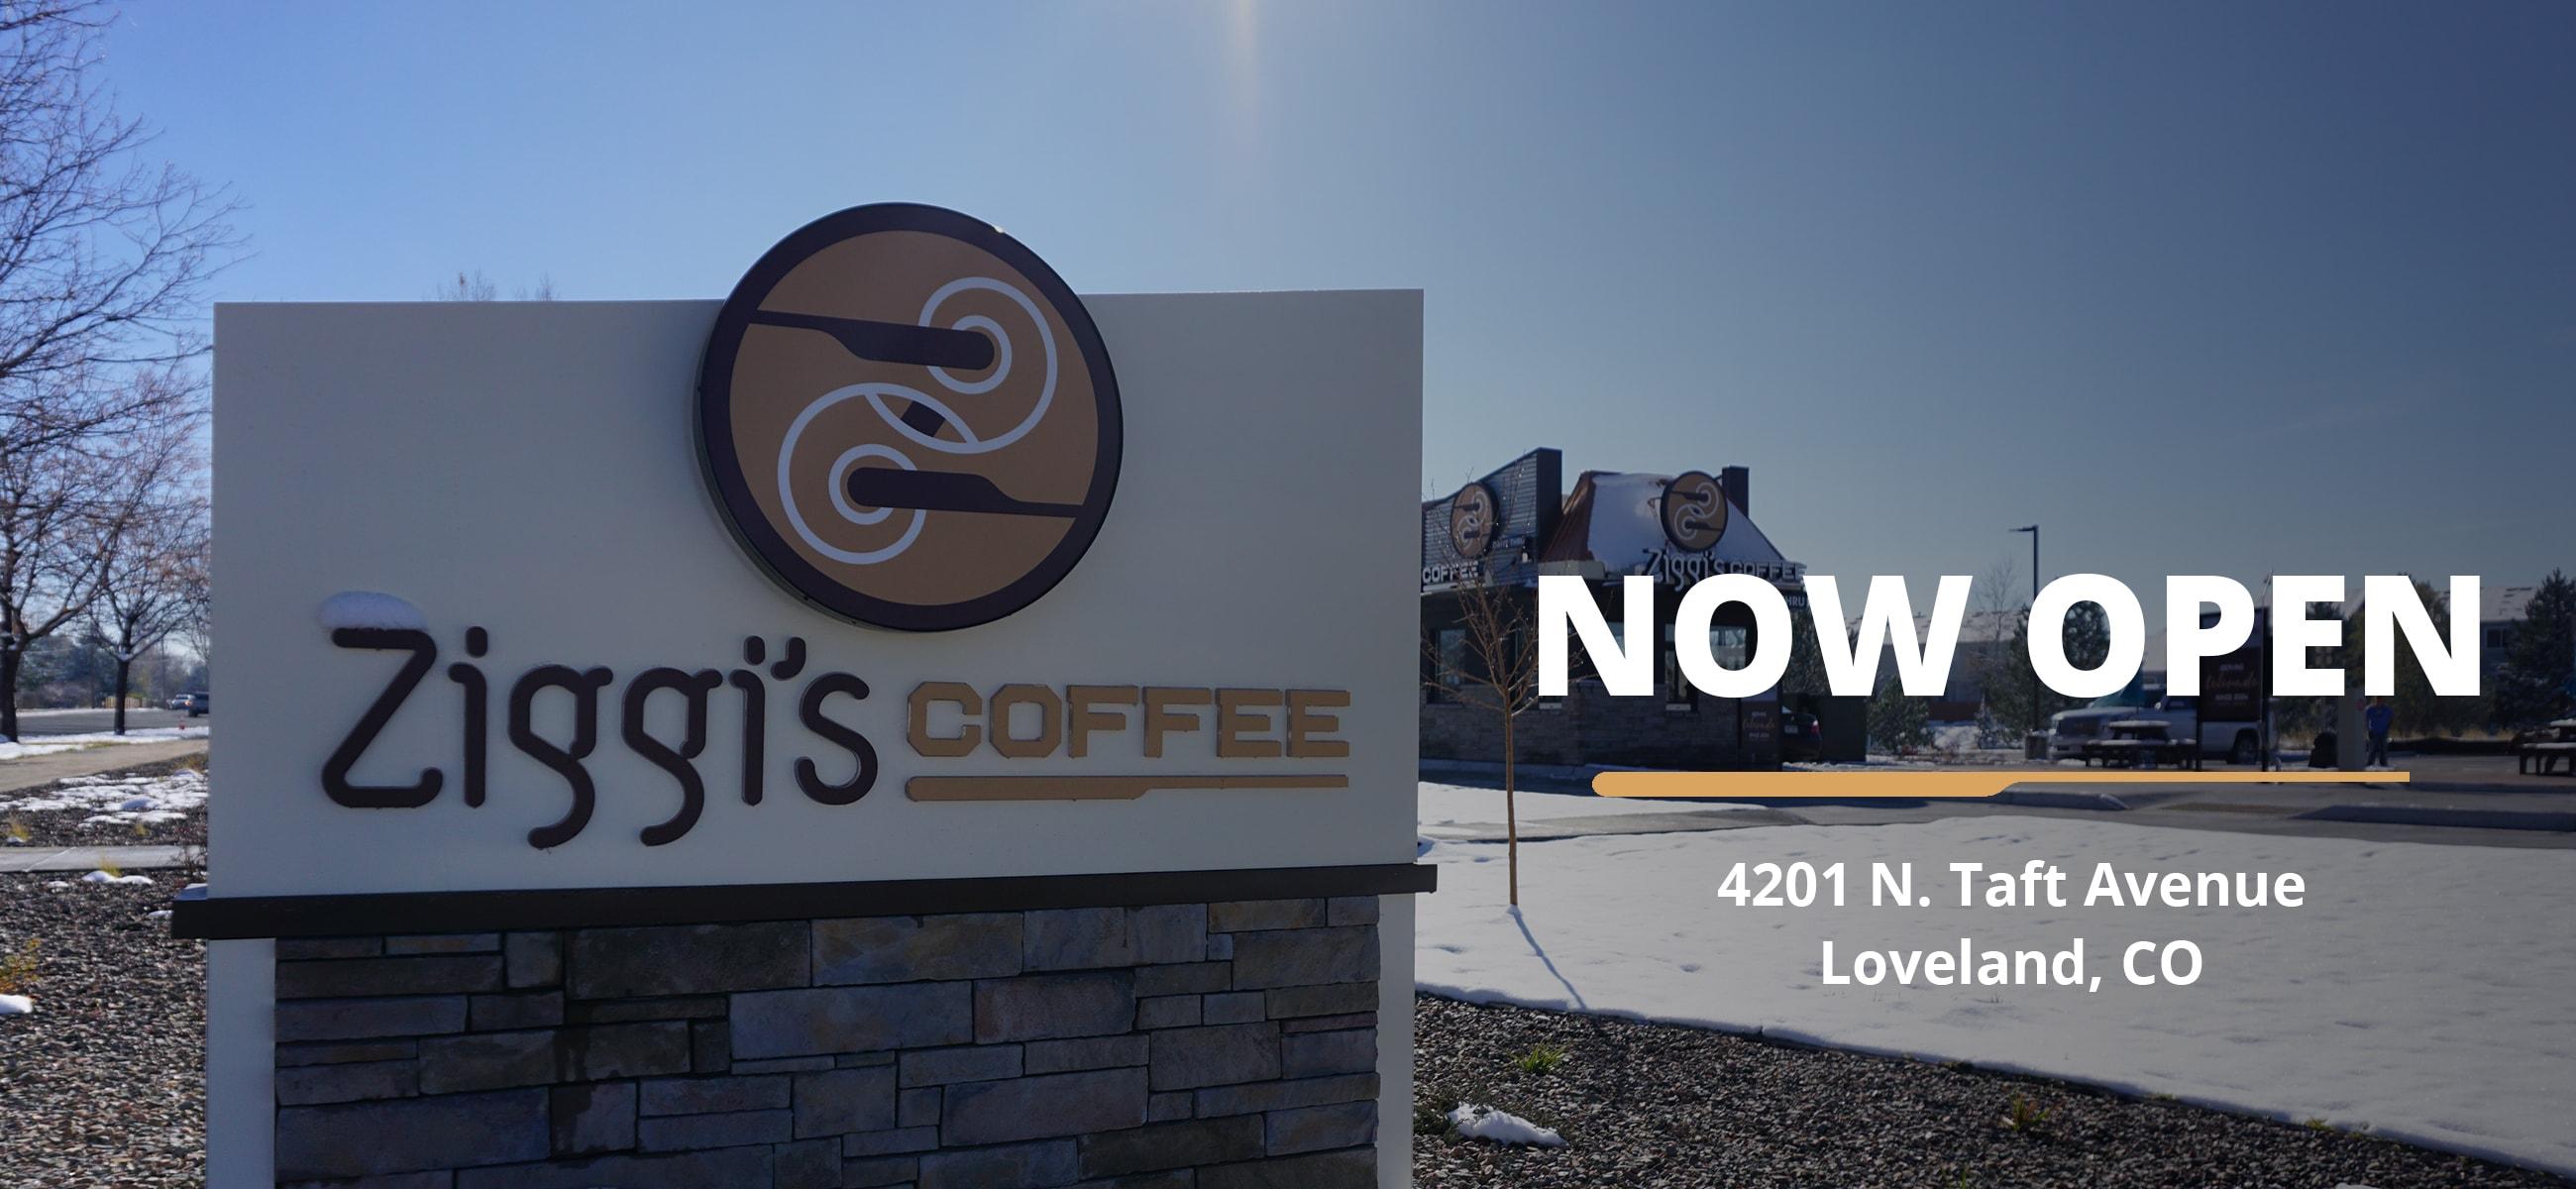 Photo of new Ziggi's Coffee Loveland location